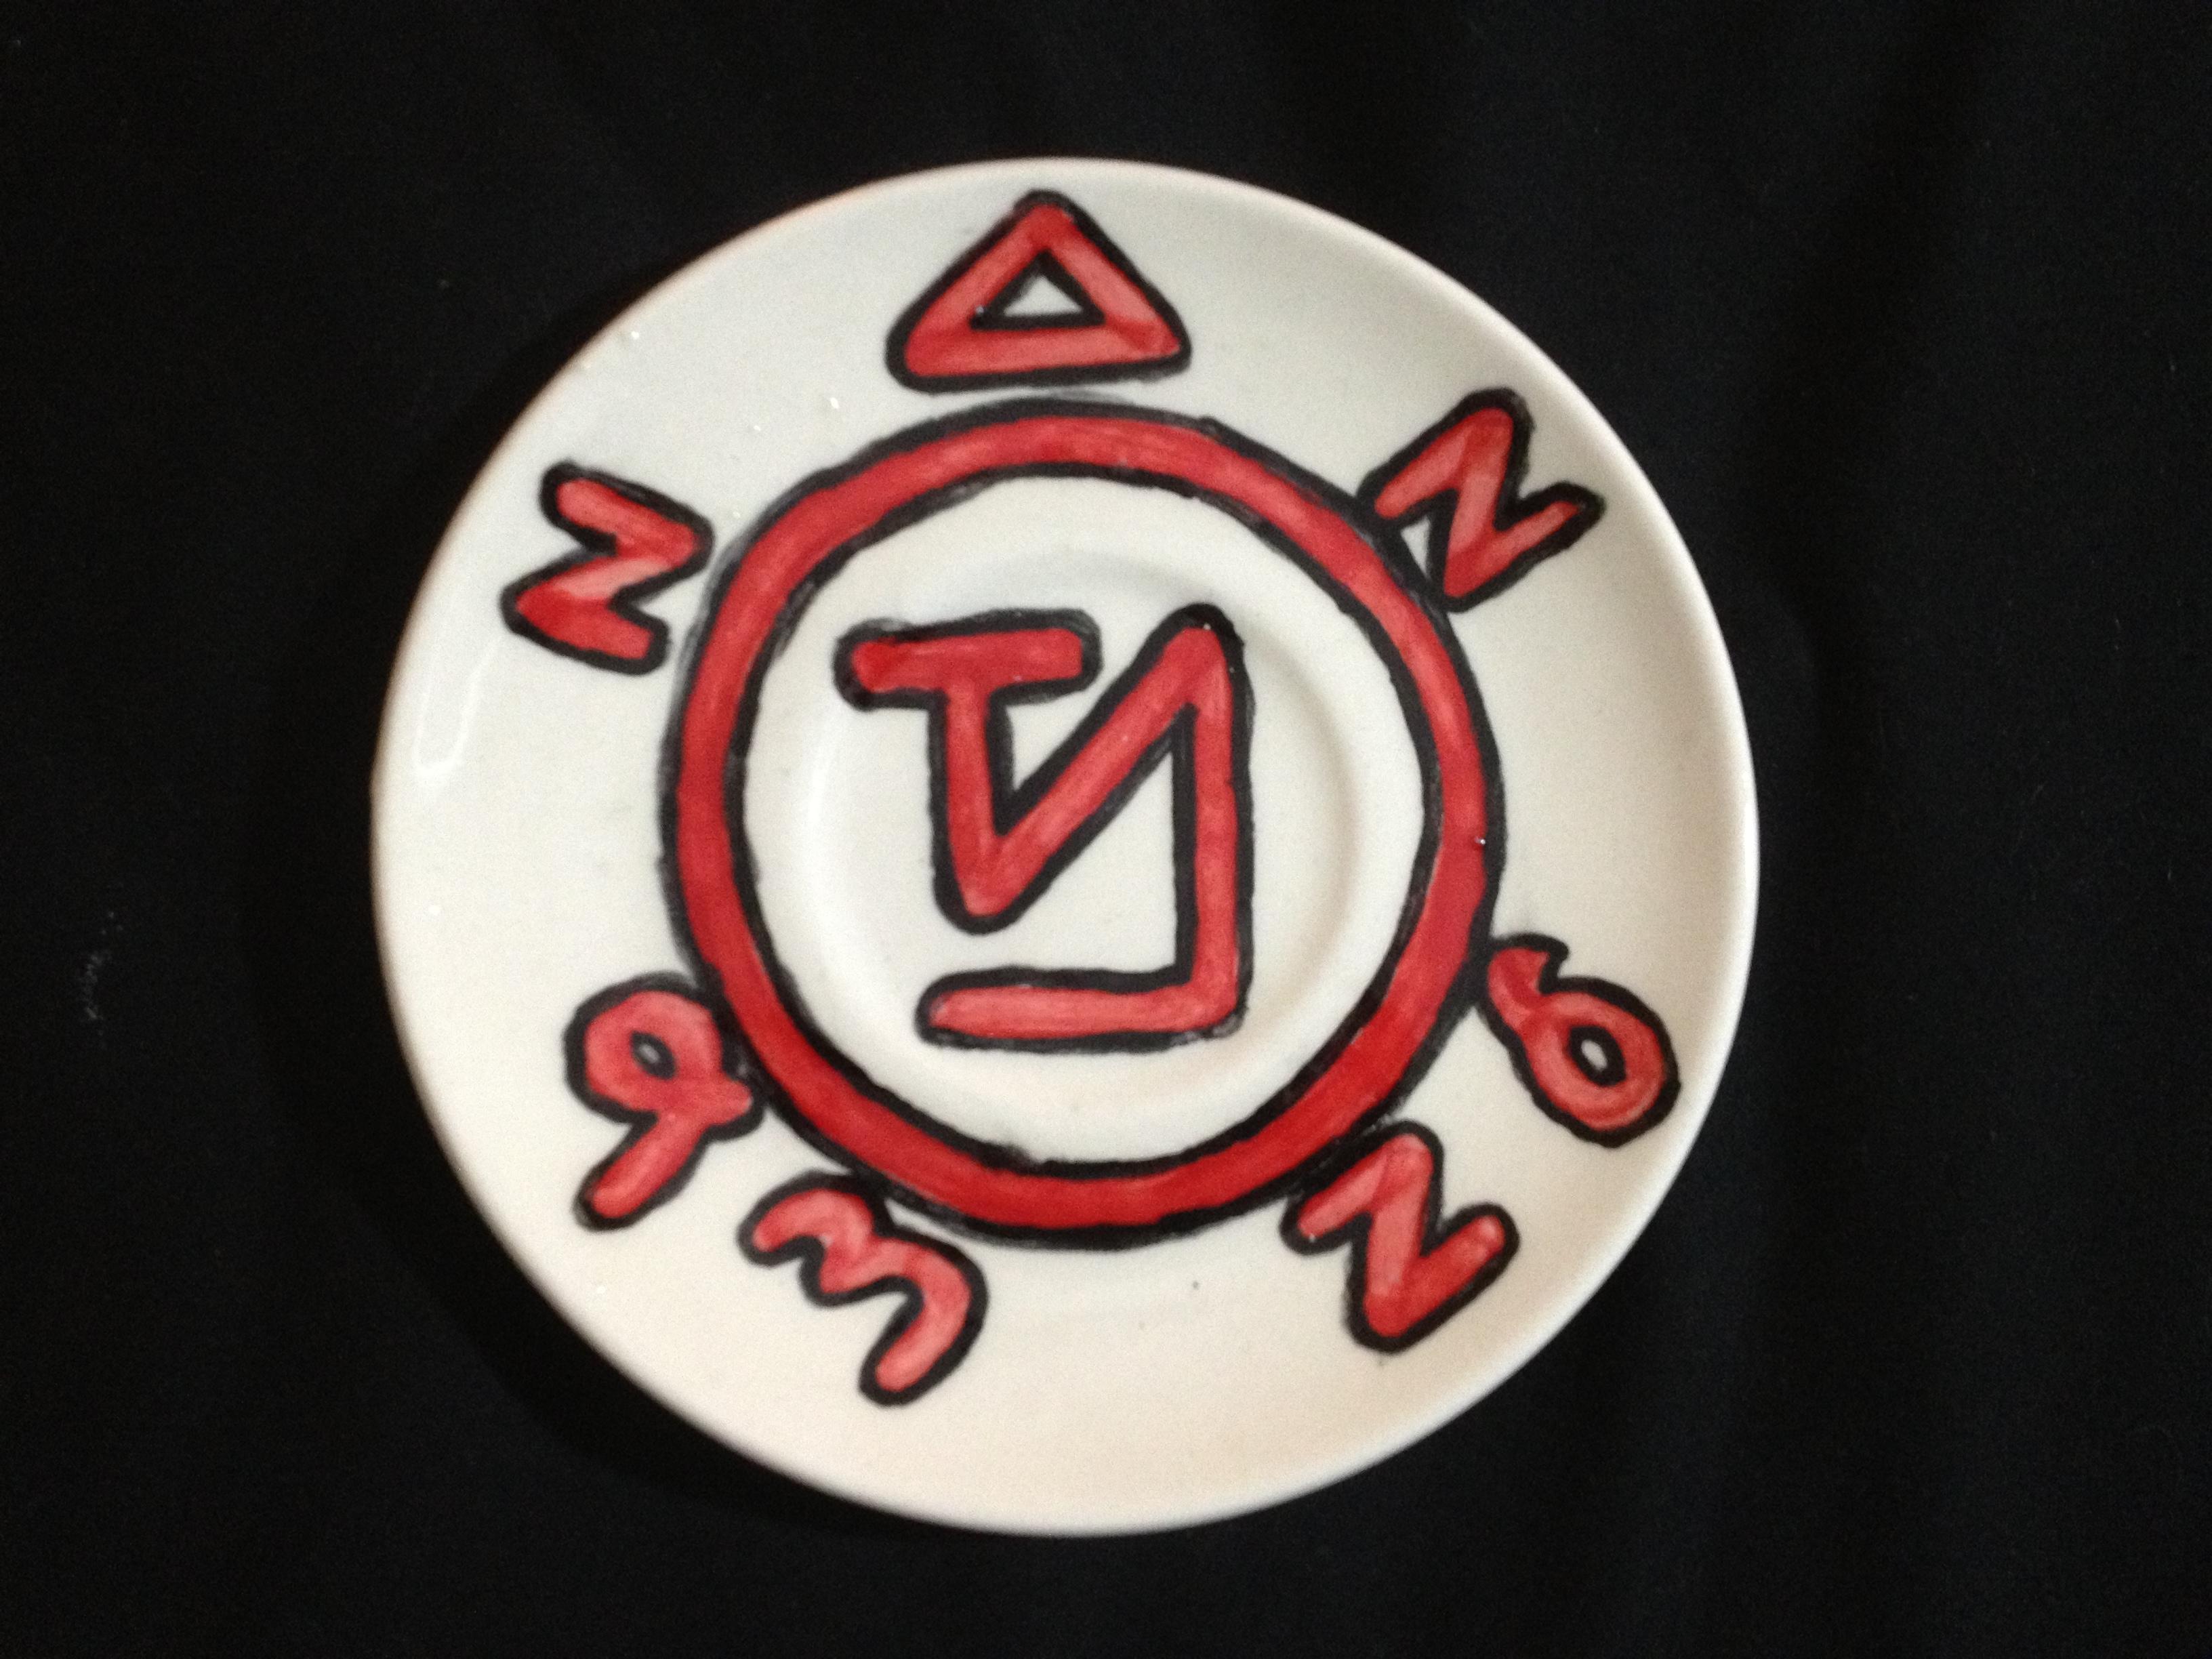 Angel banishing symbol plate custom order on storenvy 025original biocorpaavc Images